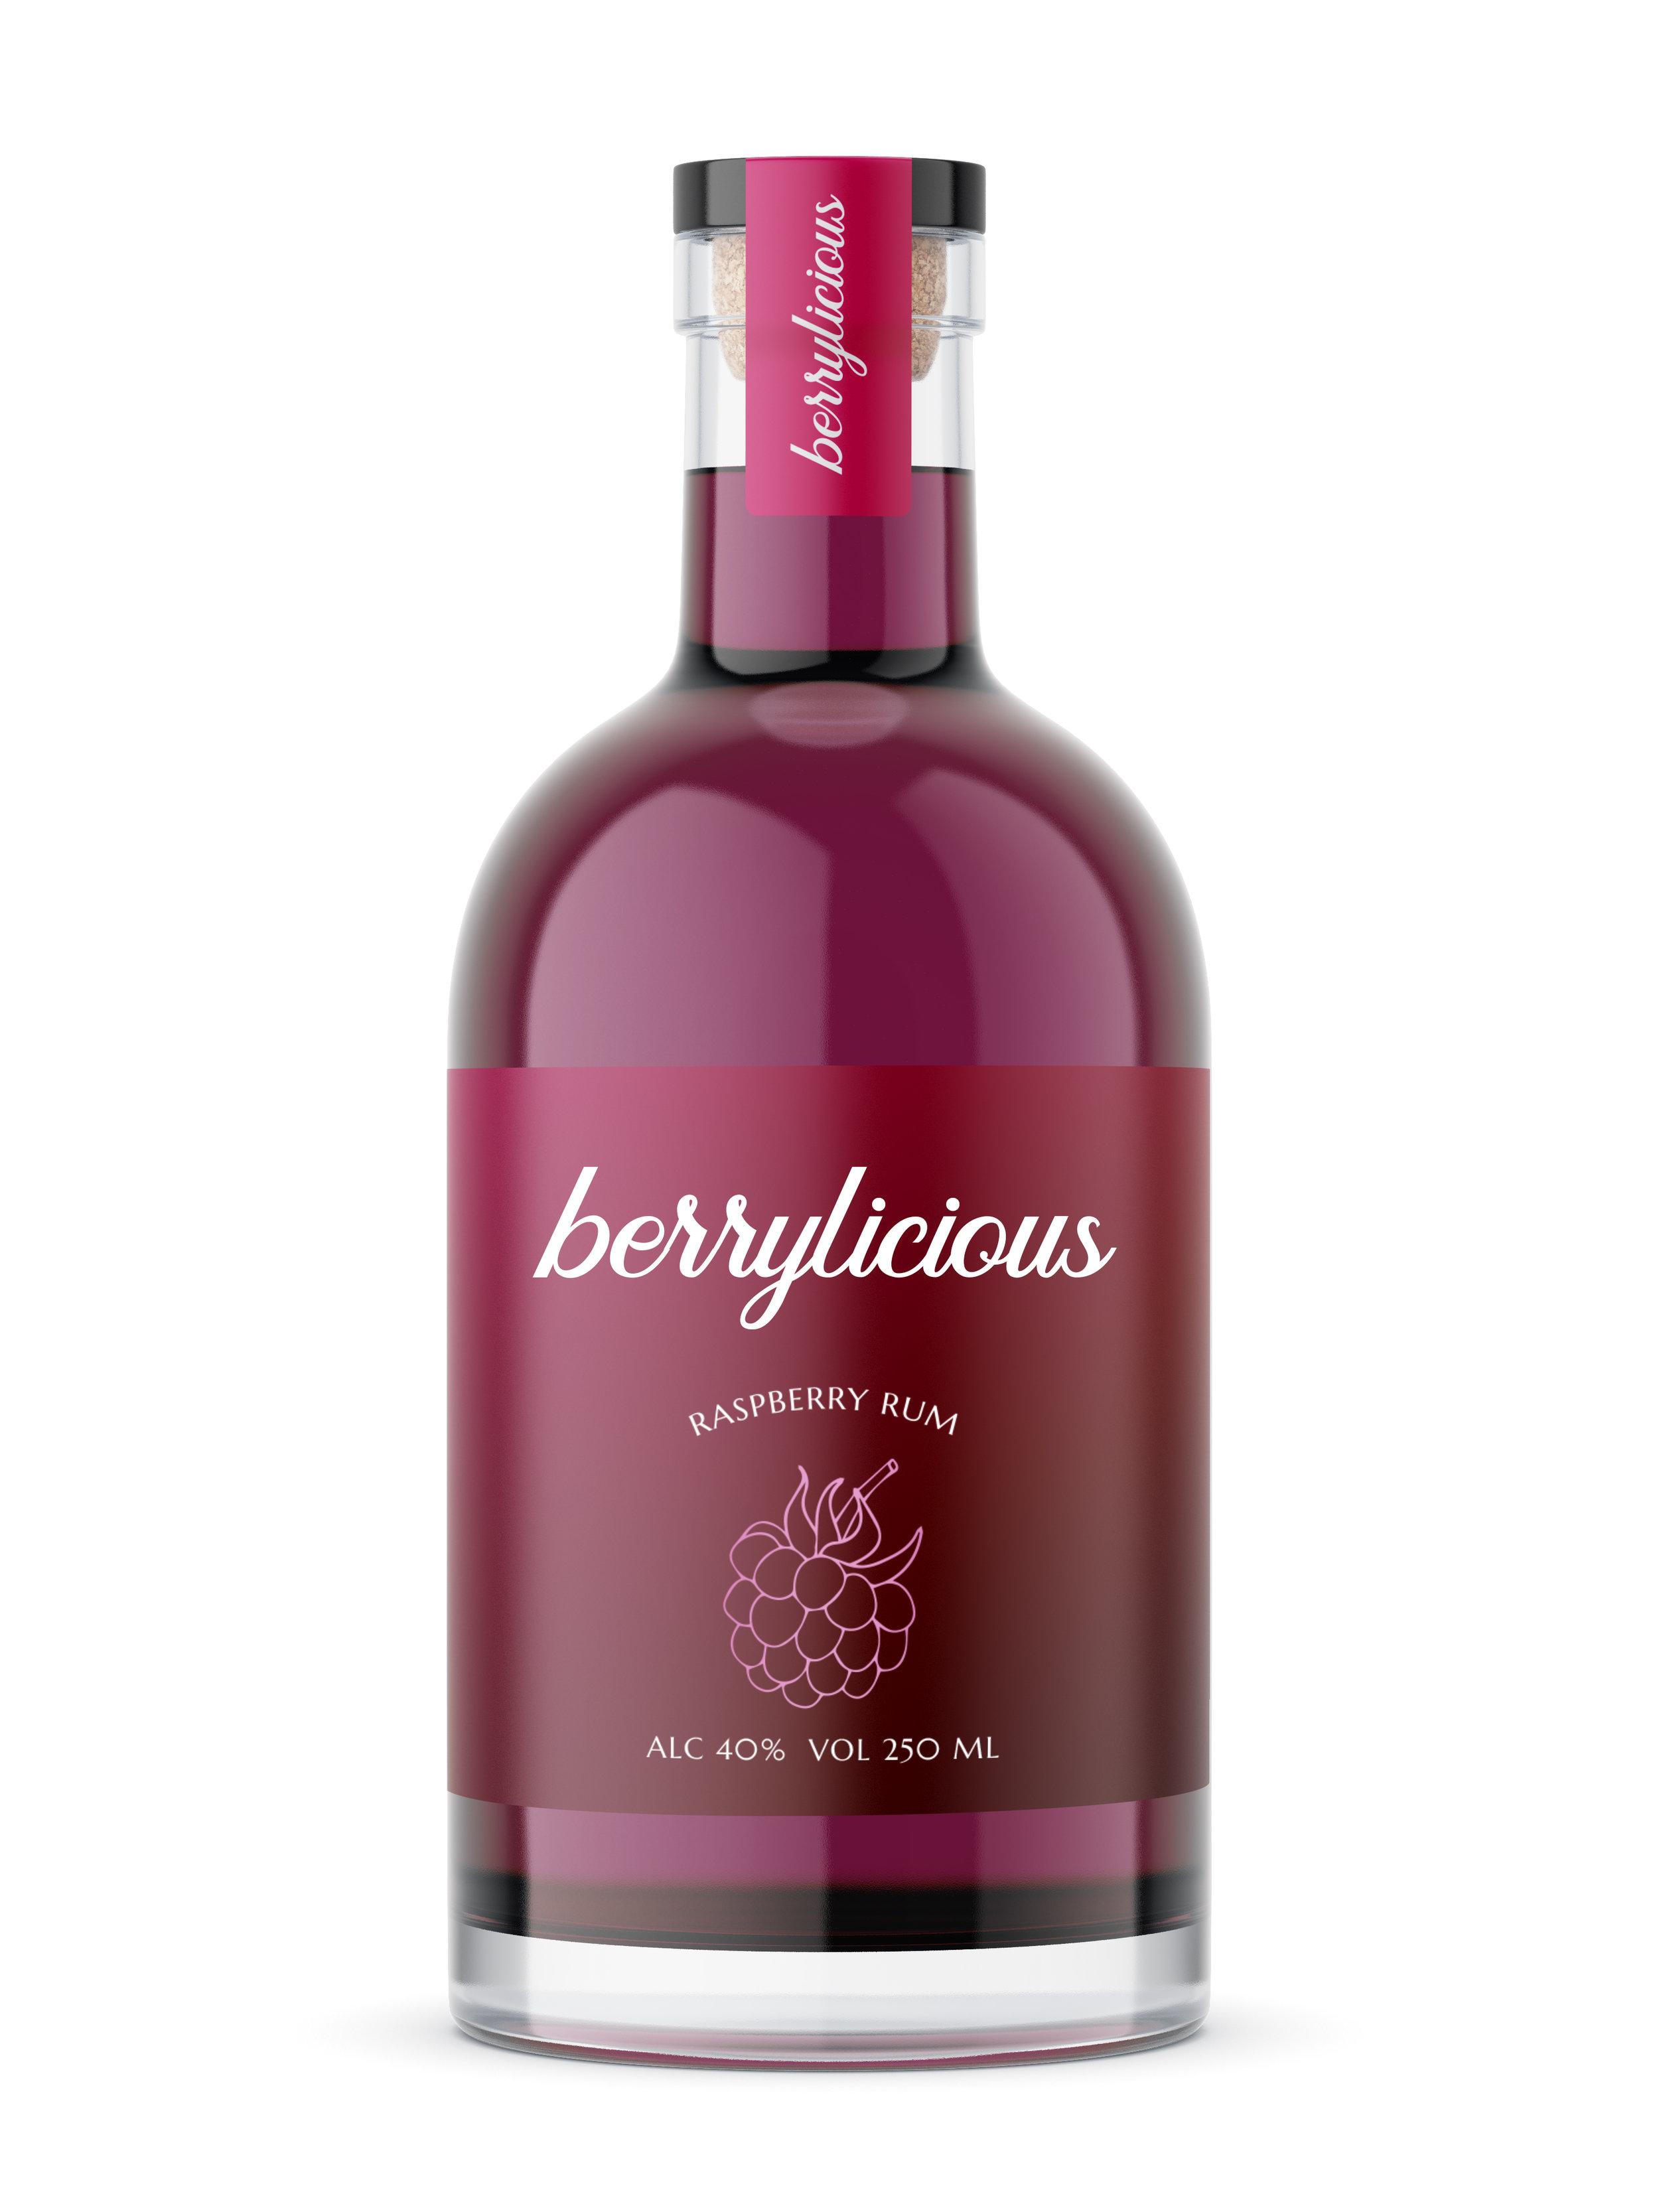 Berrylicious Raspberry Rum